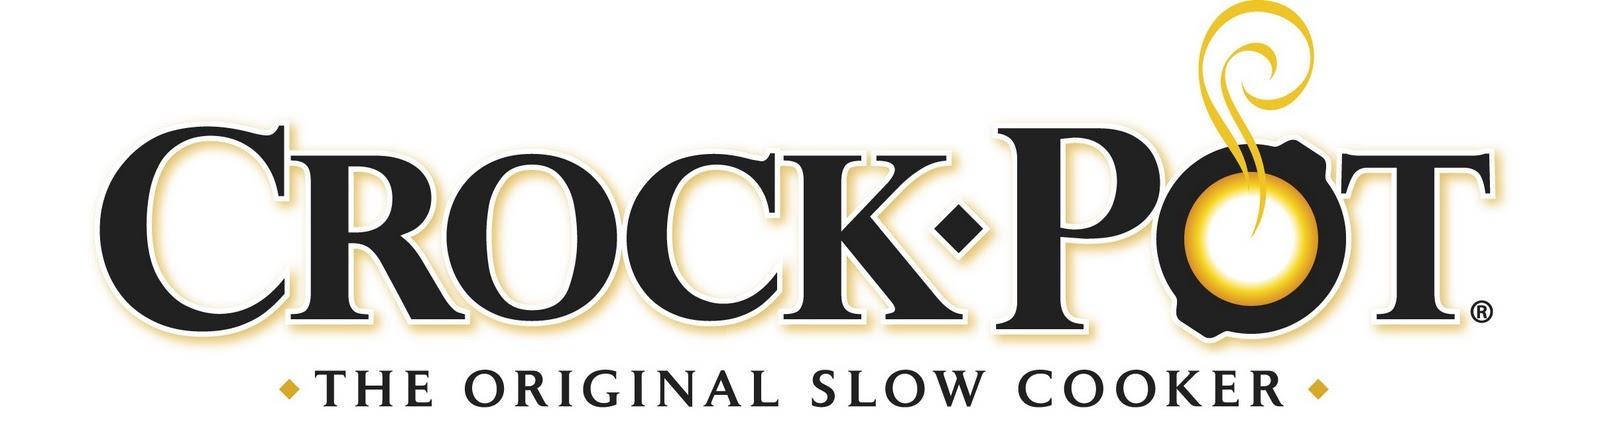 Crokpot Logo photo - 1